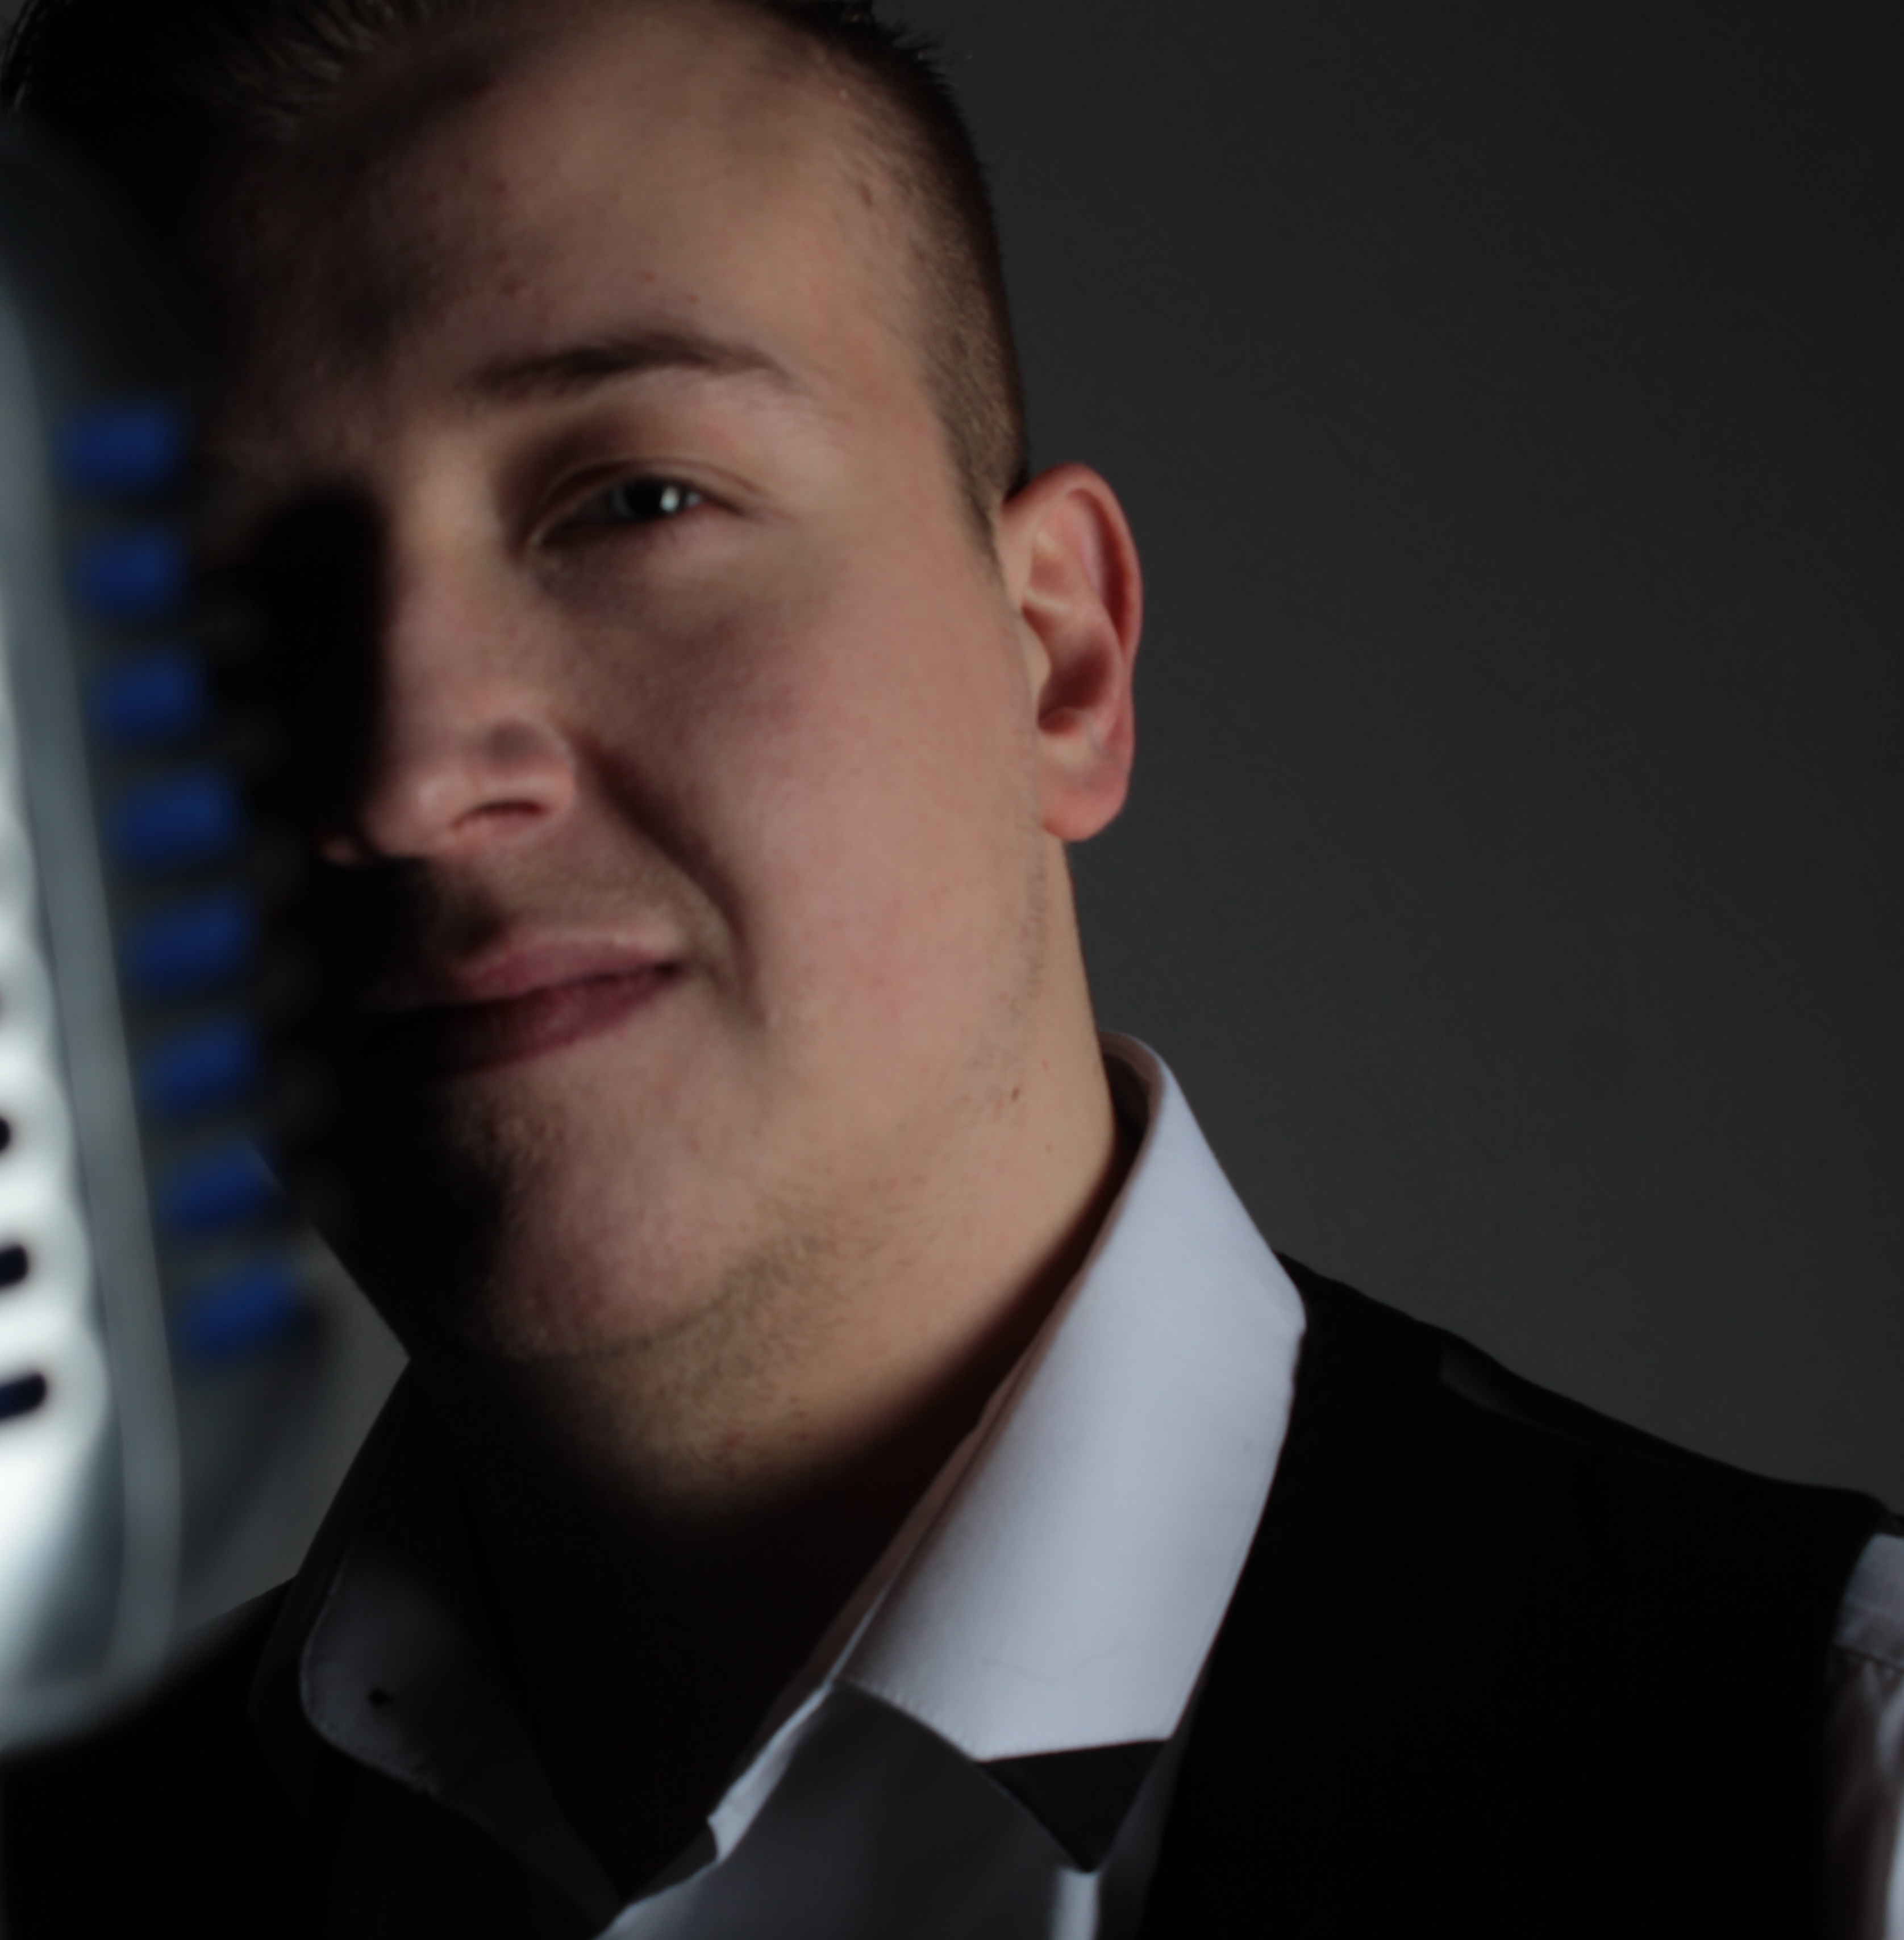 Jamie Jay - Male Singer - Vocalist & Entertainer